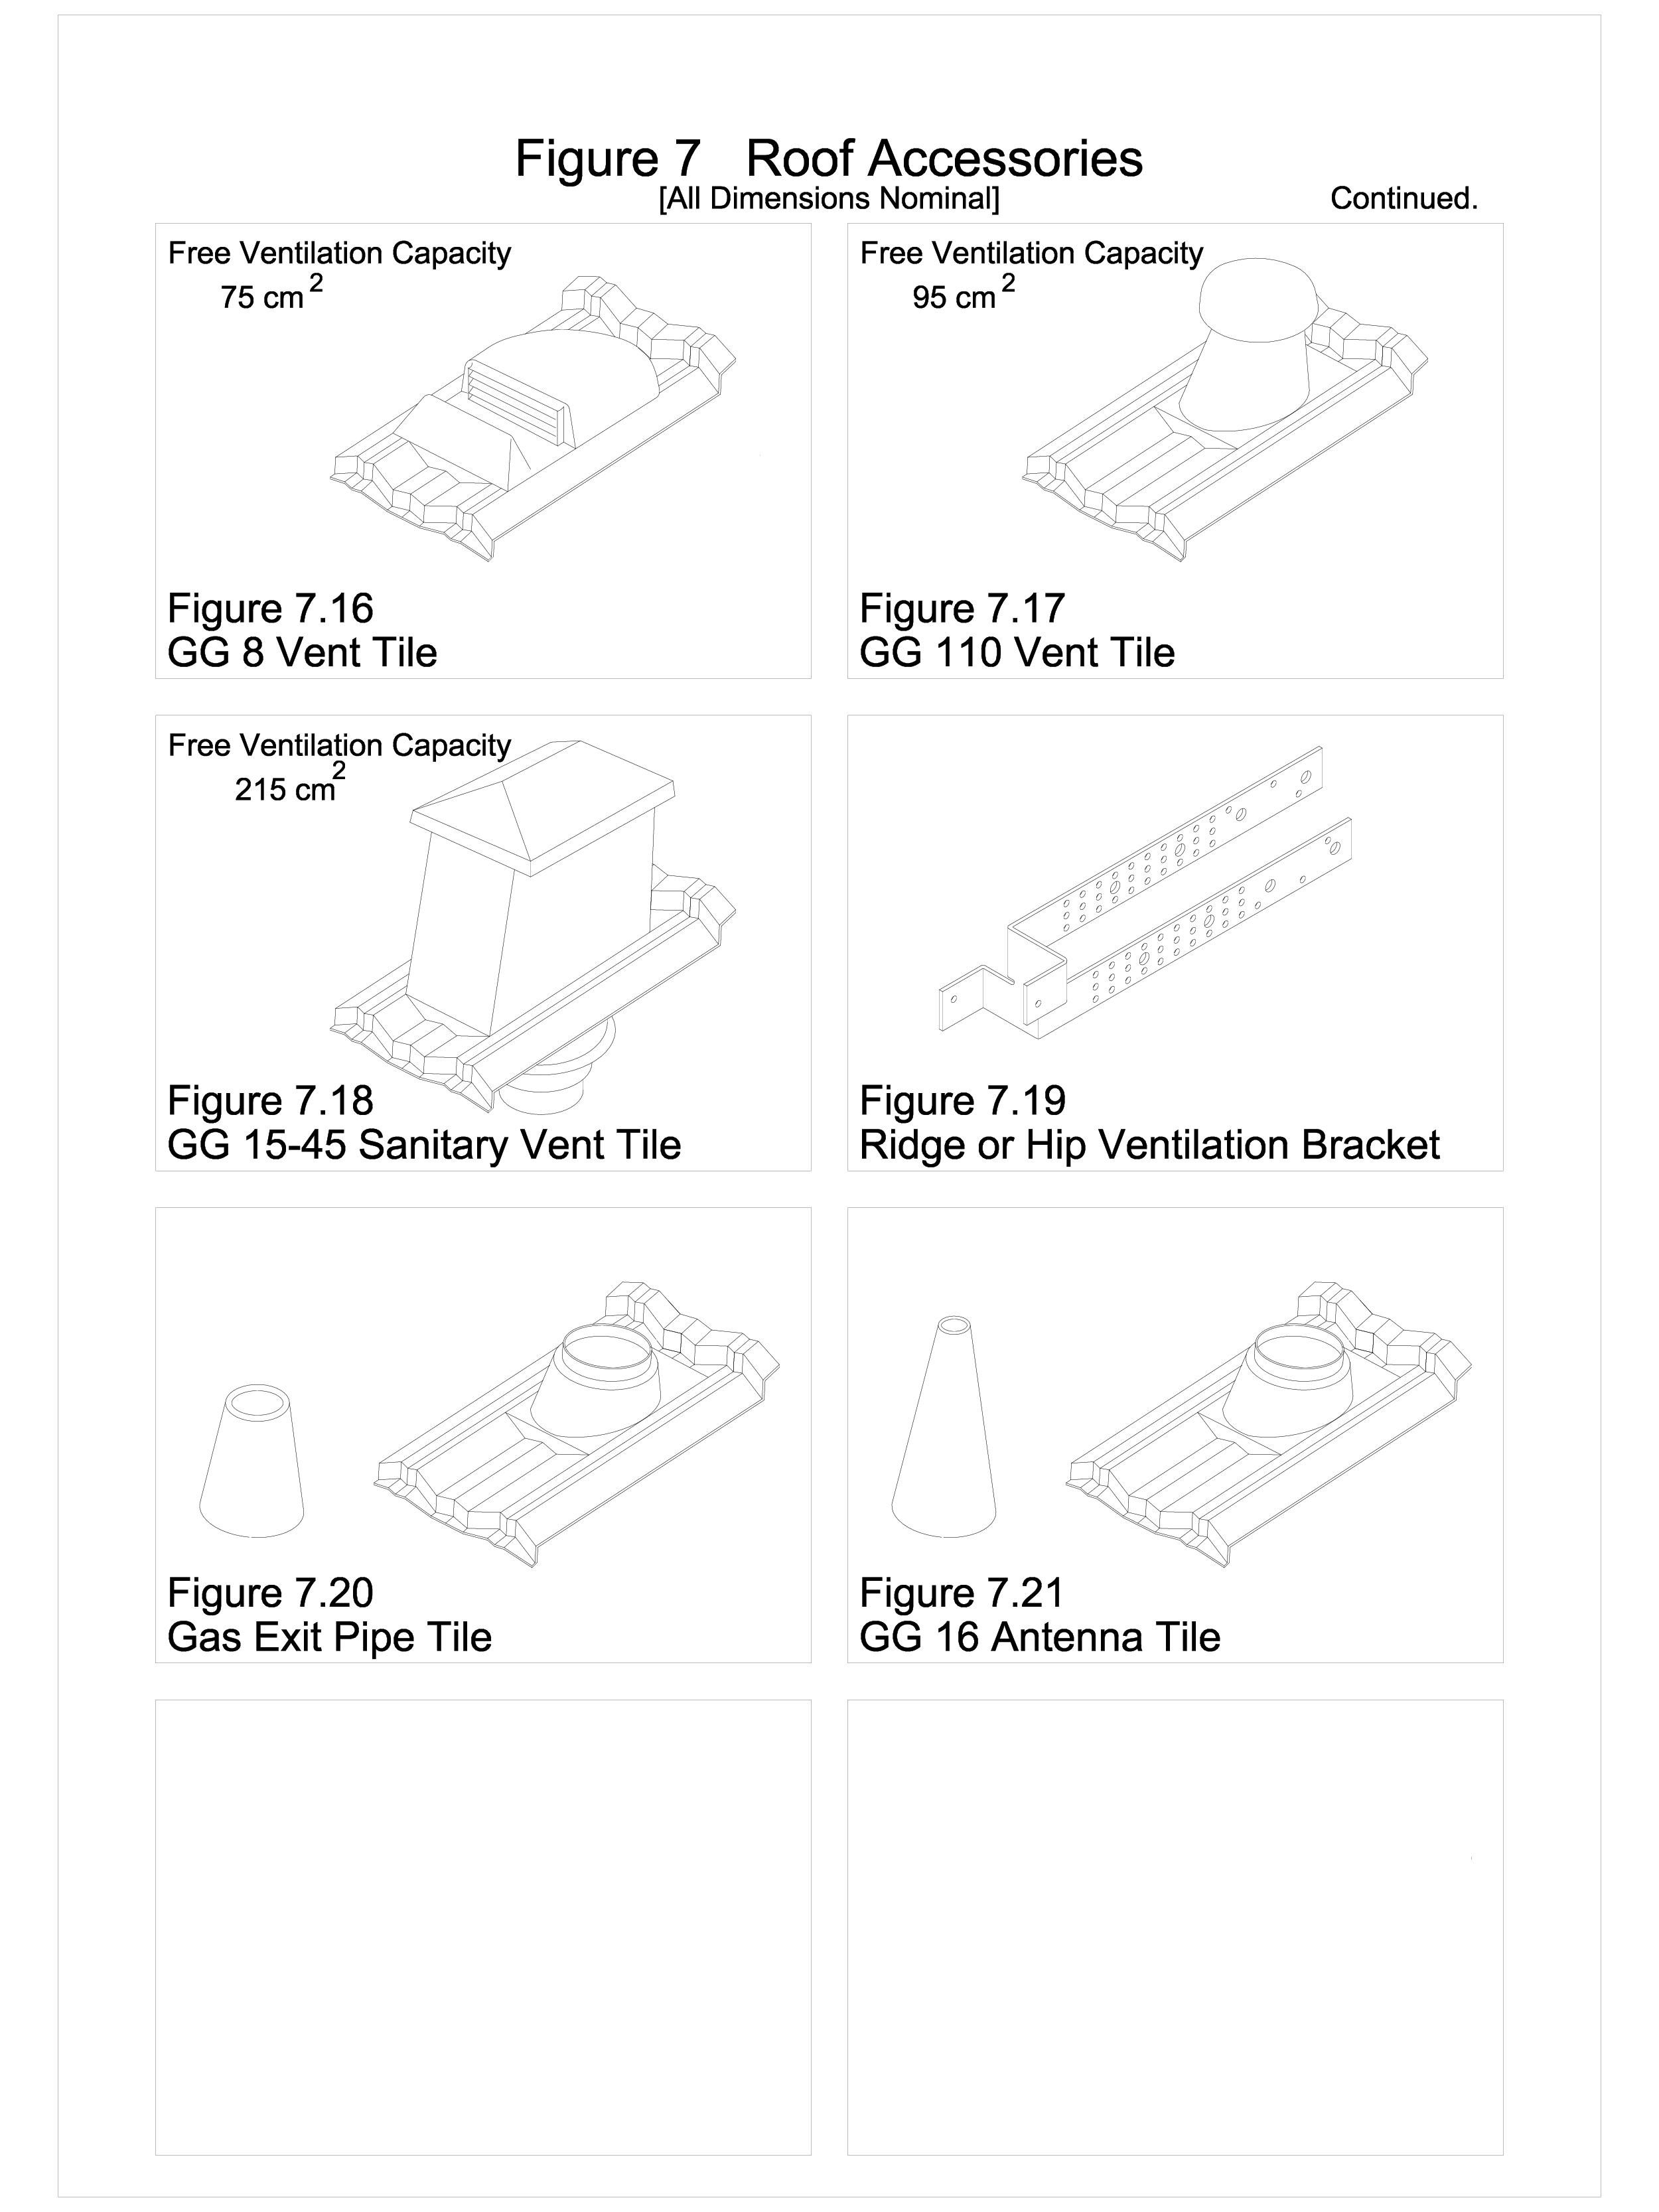 Detalii de imbinare cu tigle speciale de ventilare si de strapungere SHAKE, MILANO, HERITAGE, CLASSIC, SHINGLE, DIAMANT GERARD Acoperis cu tigla metalica cu acoperire de piatra naturala FINAL DISTRIBUTION  - Pagina 1